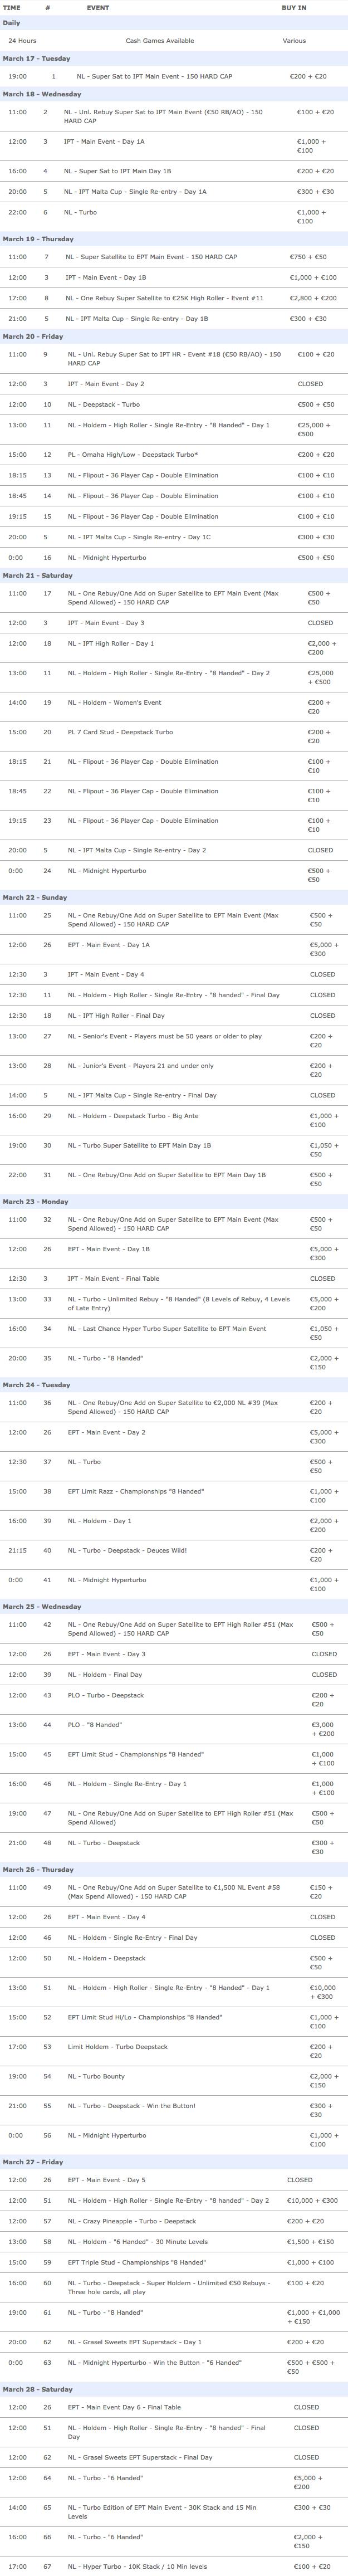 ept malta 2015 official schedule